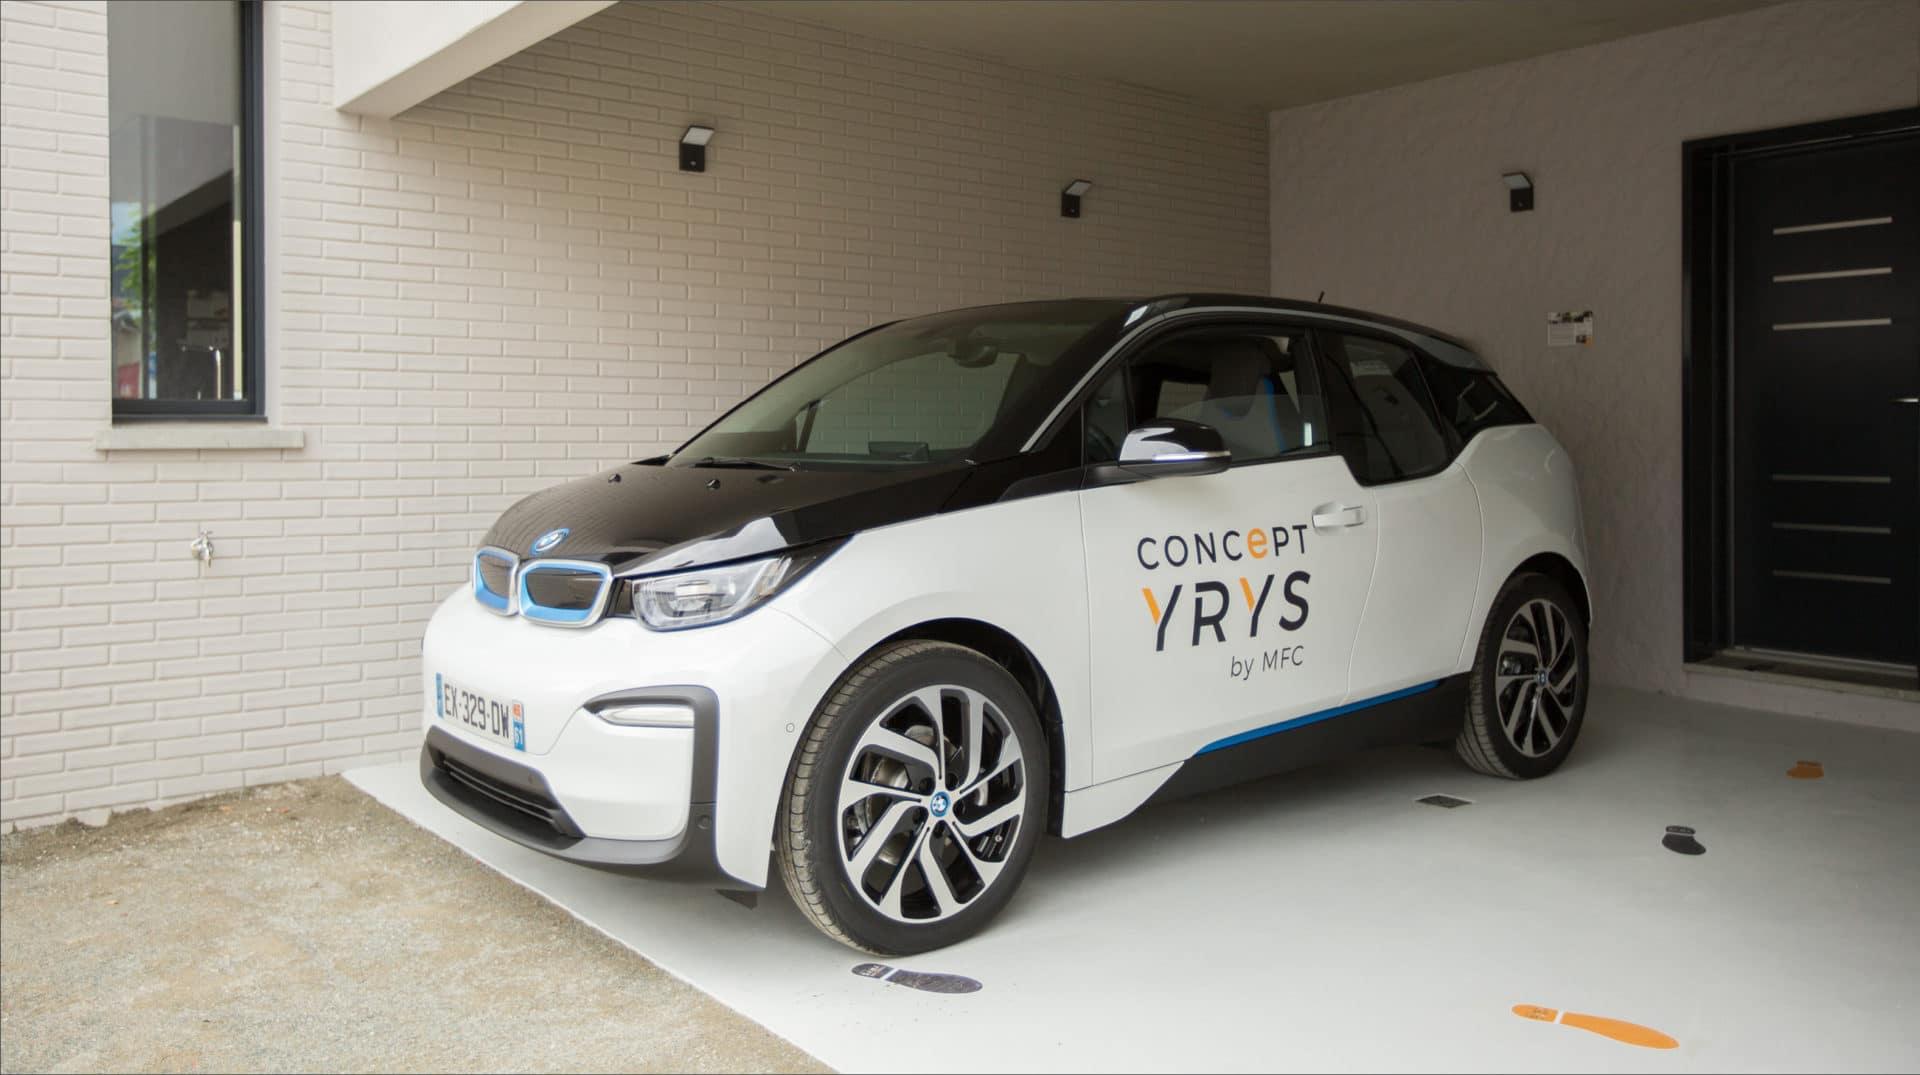 BMW i3 - Concept YRYS